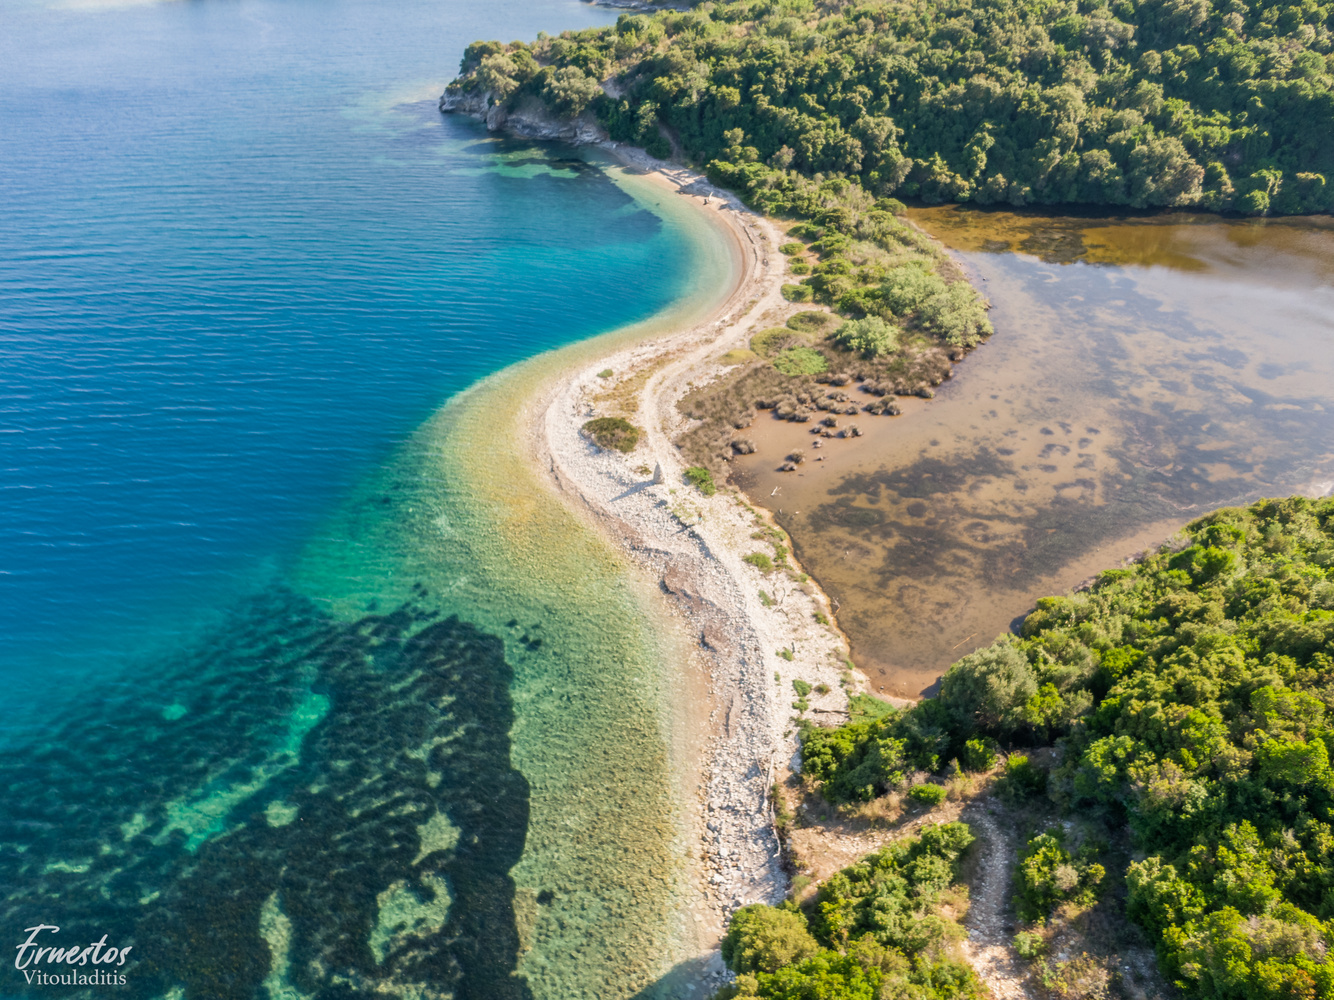 Erimitis corfu beautiful beach by ernestos vitouladitis